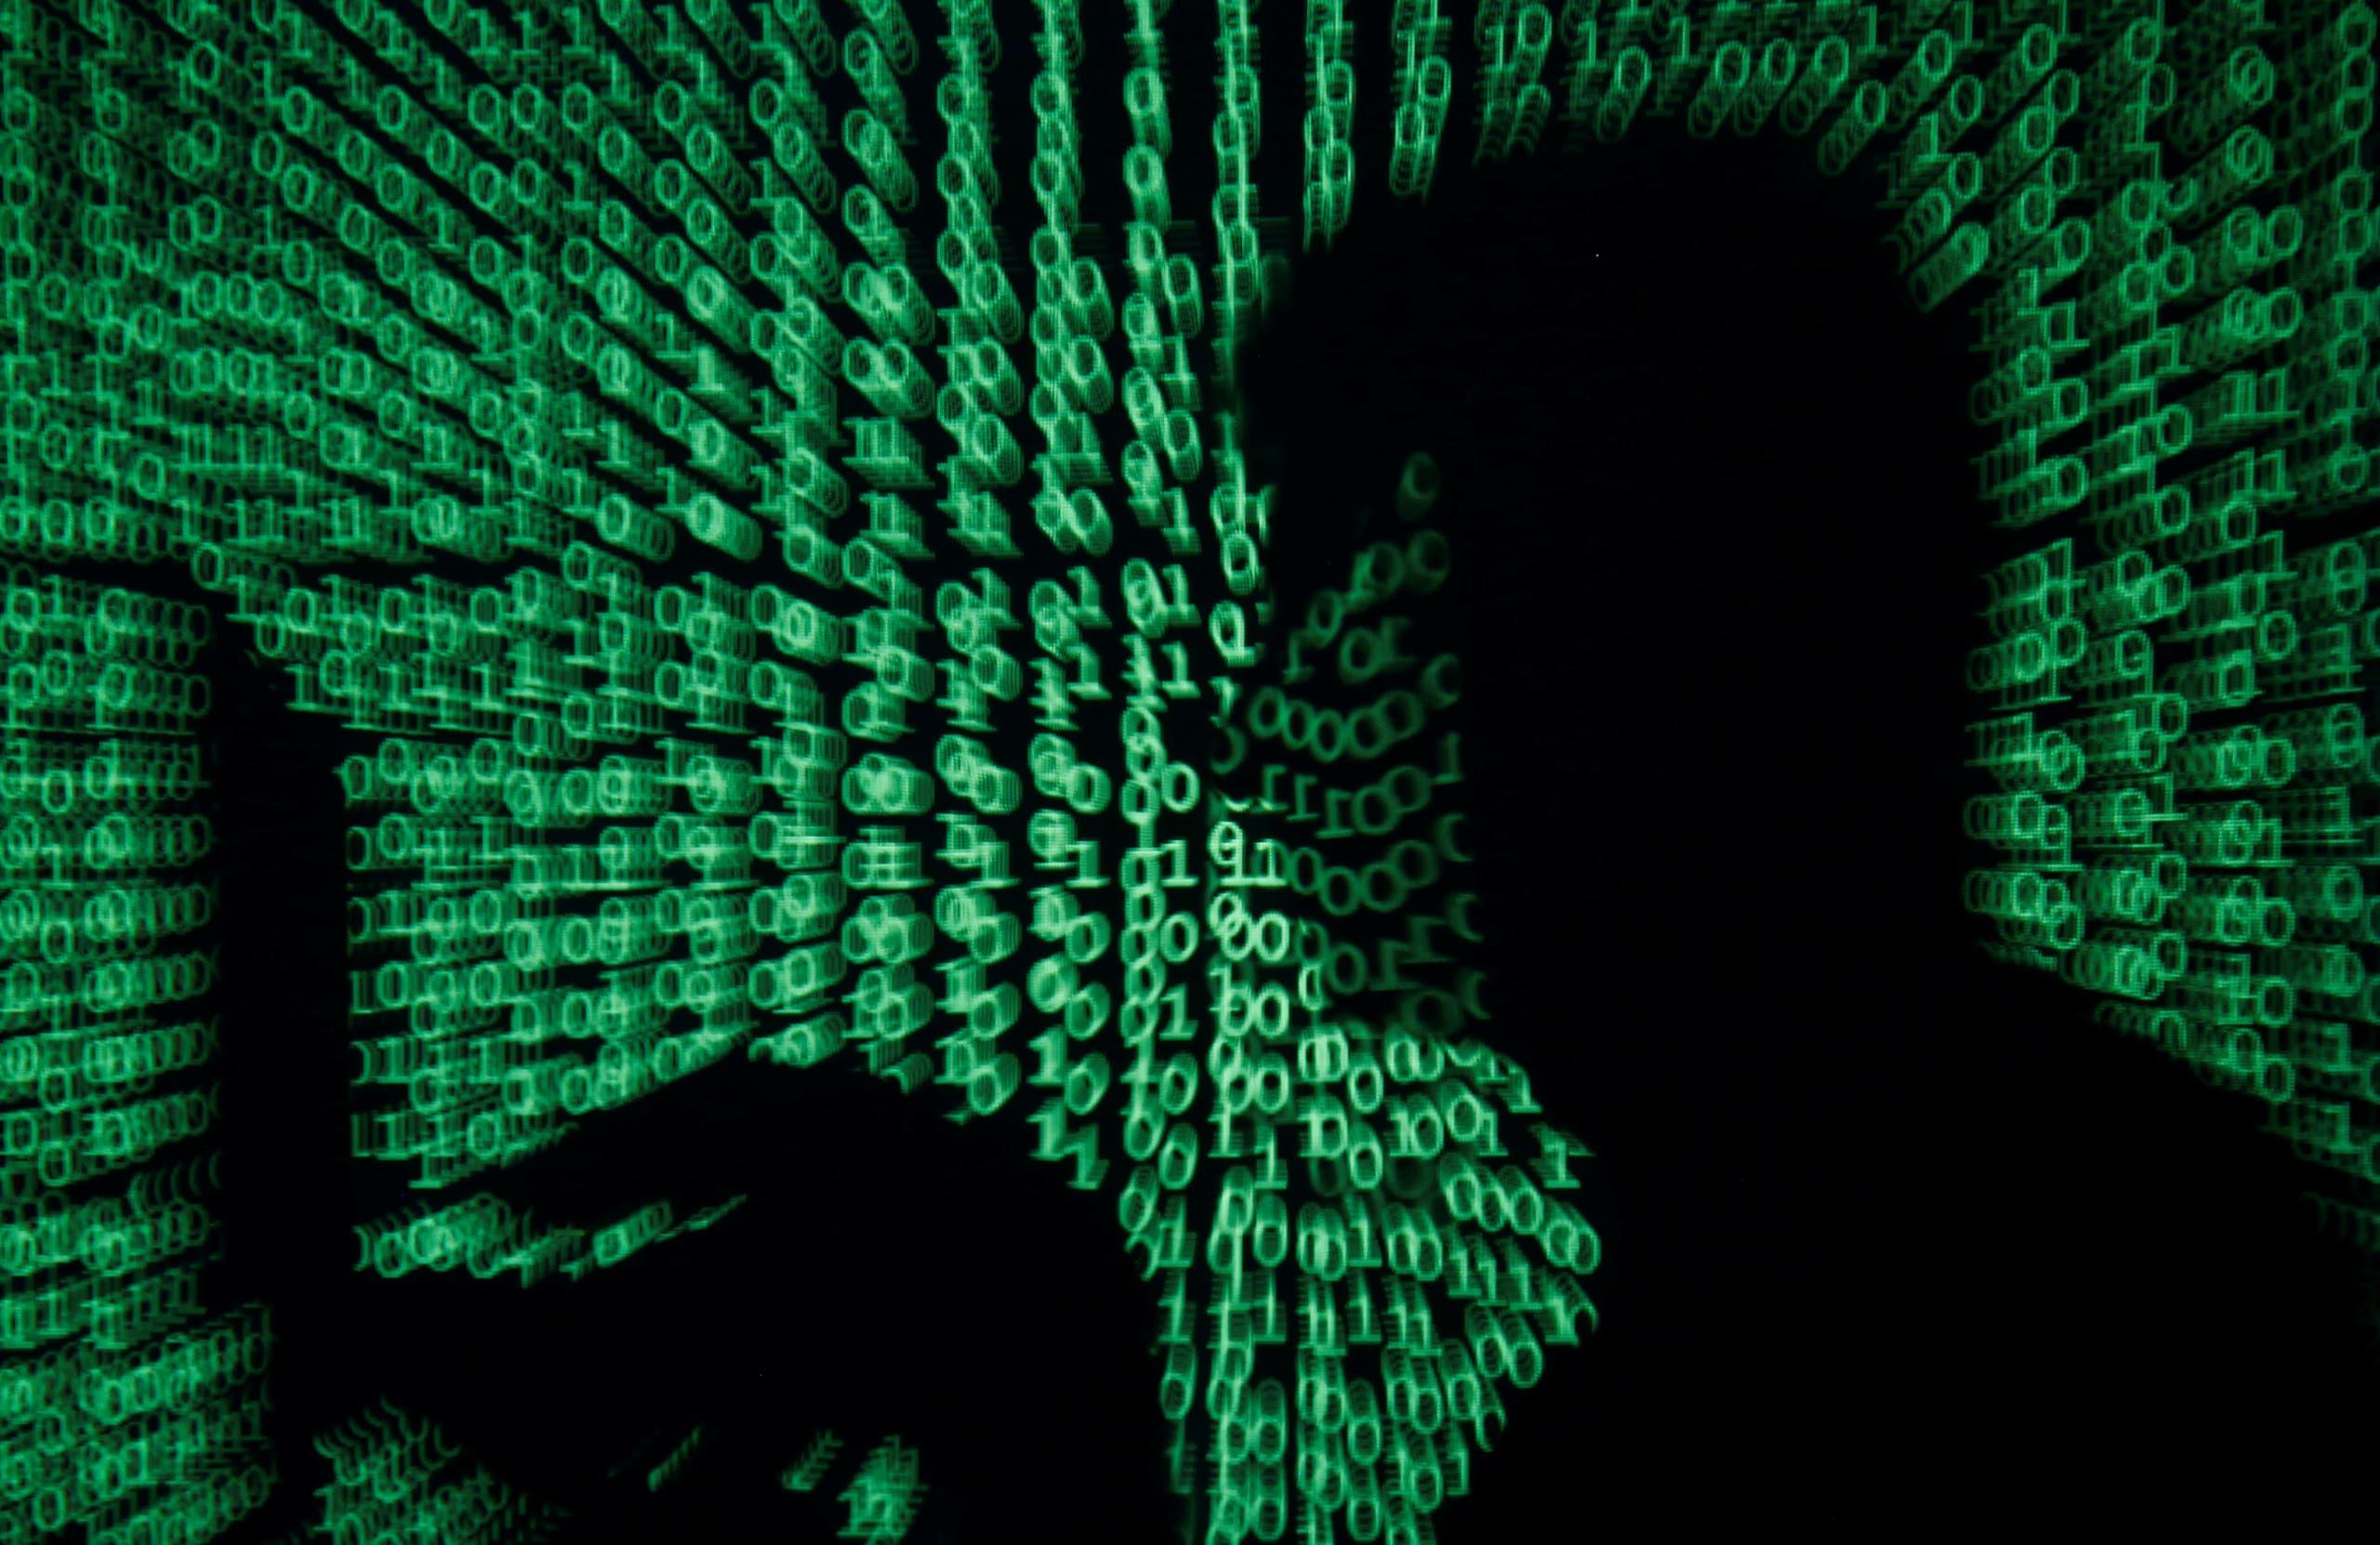 An illustrative image depicting a computer hacker. (Reuters)